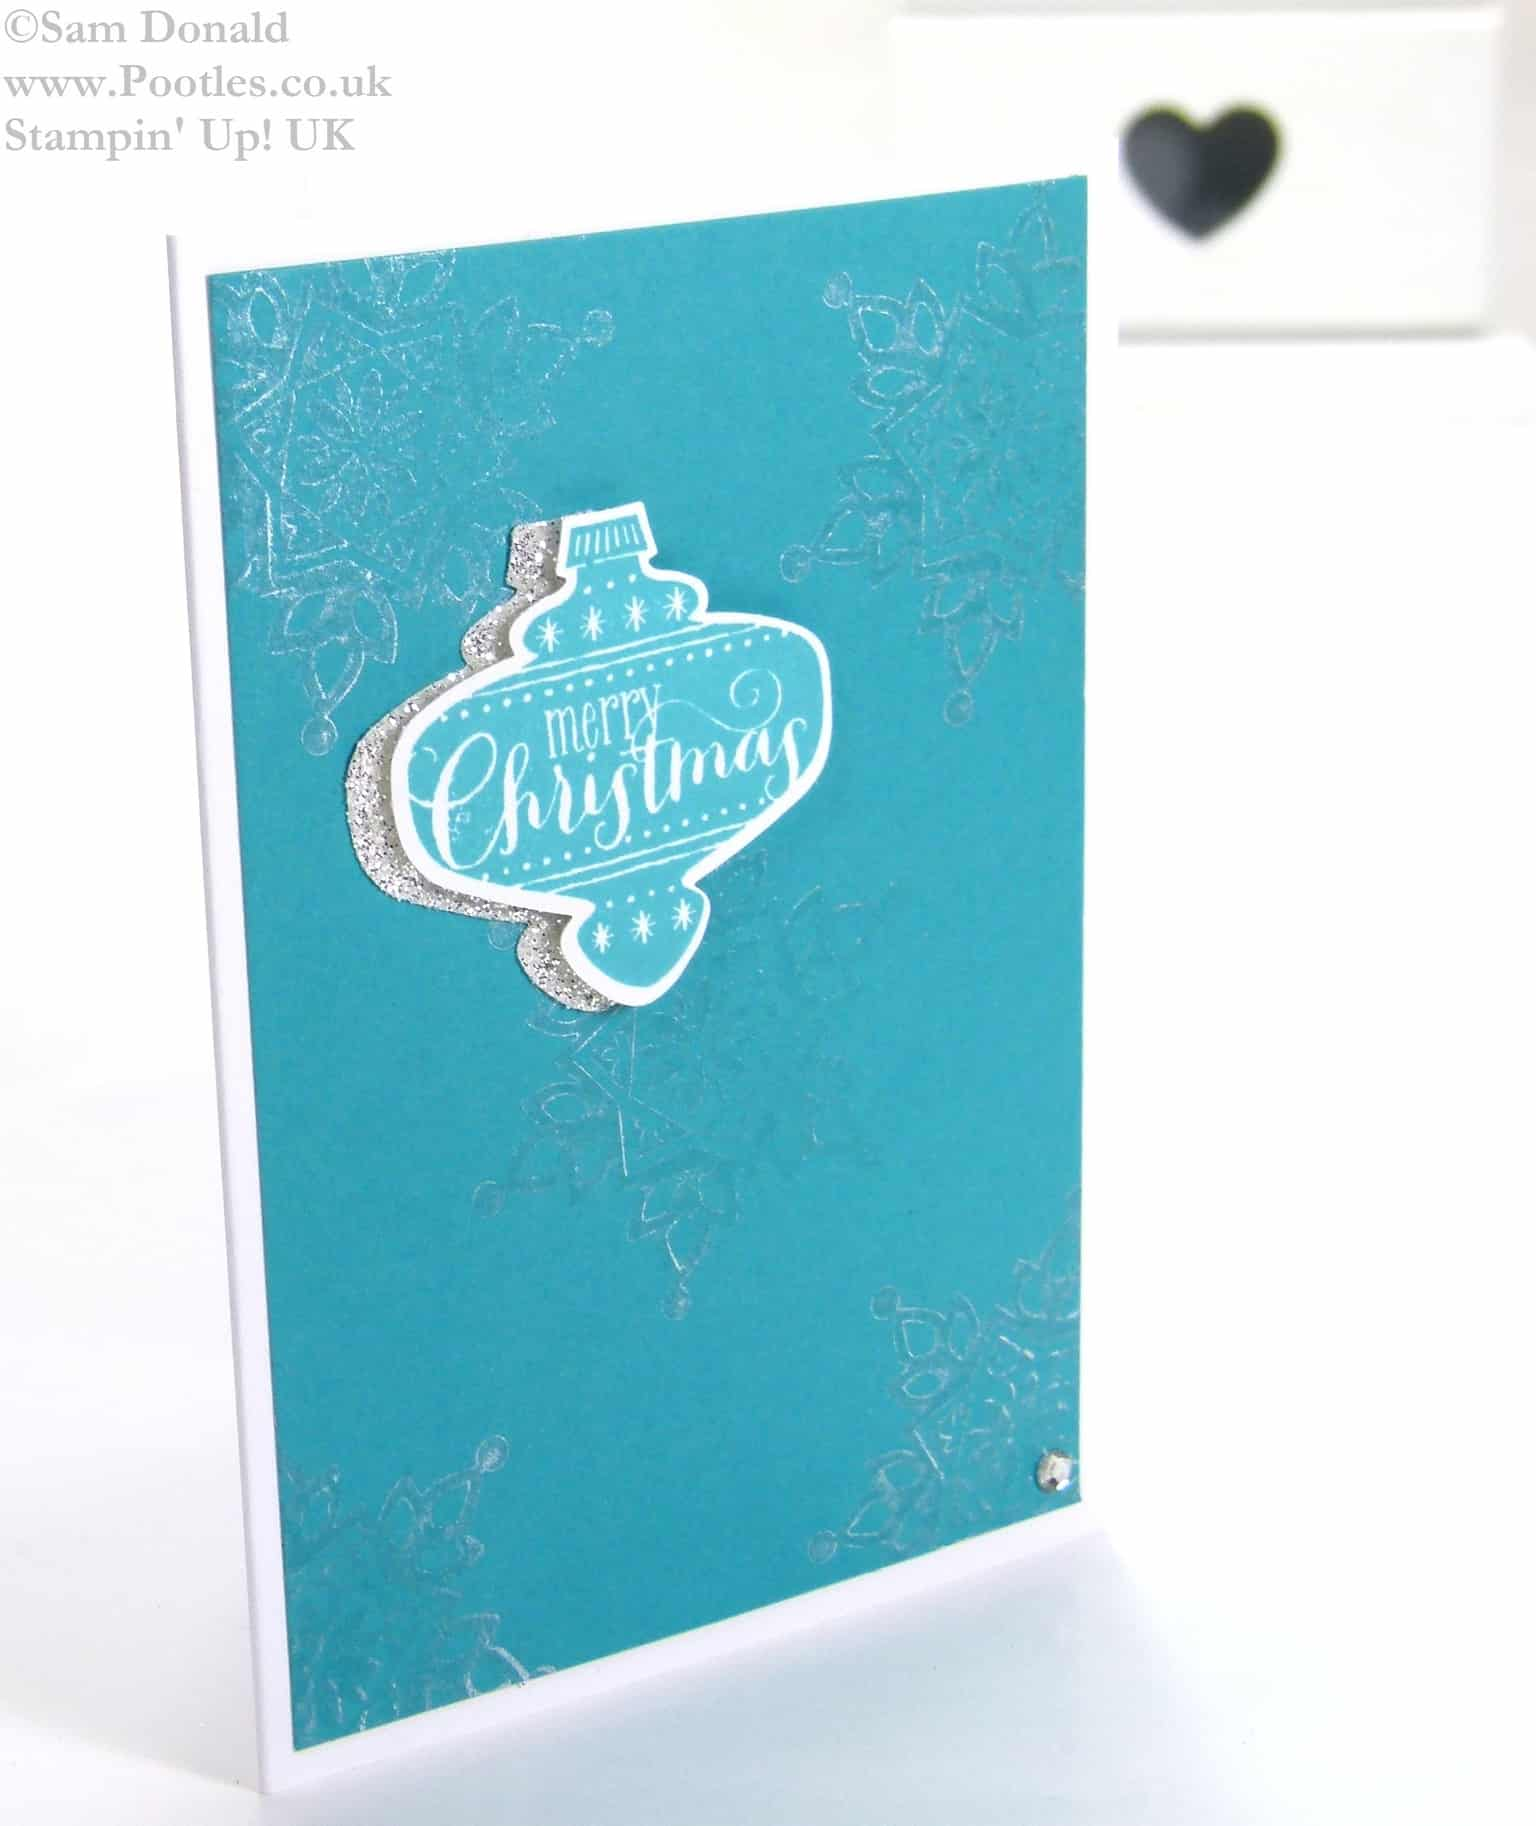 POOTLES Stampin Up UK Customer Christmas Cards 4